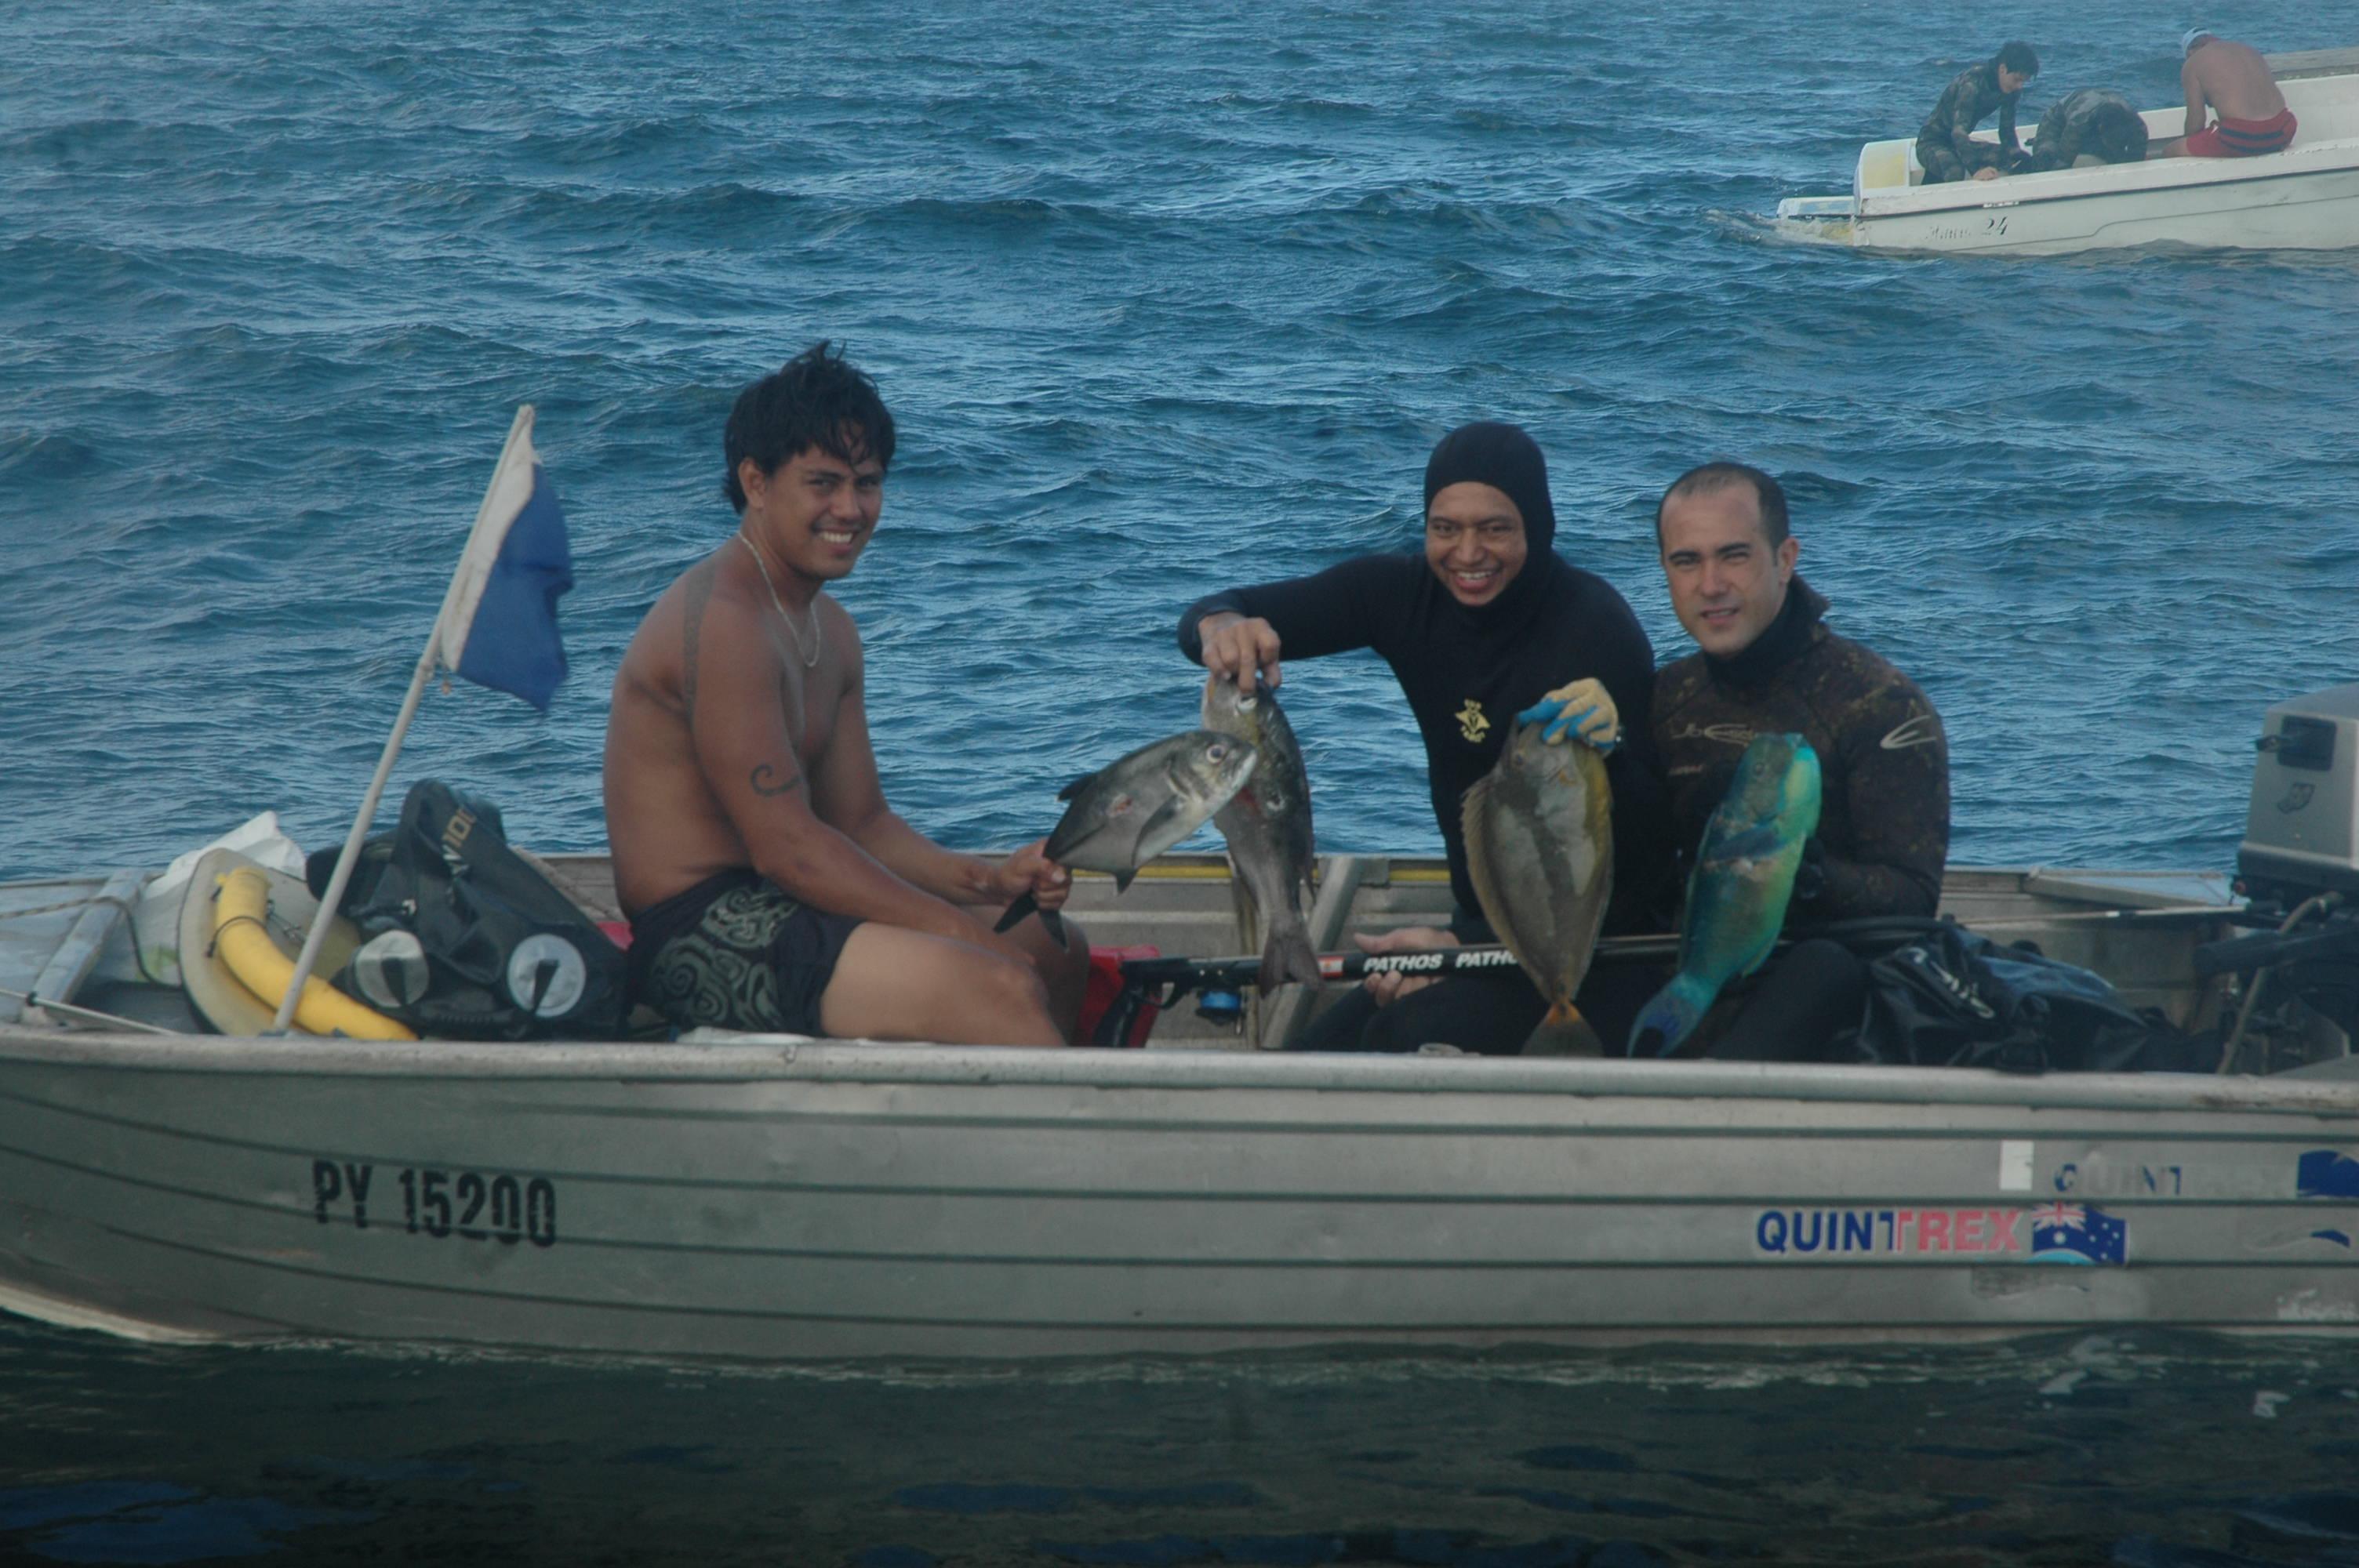 2ième édition Coupe marara flying day pêche sous marine, ce samedi 26 septembre